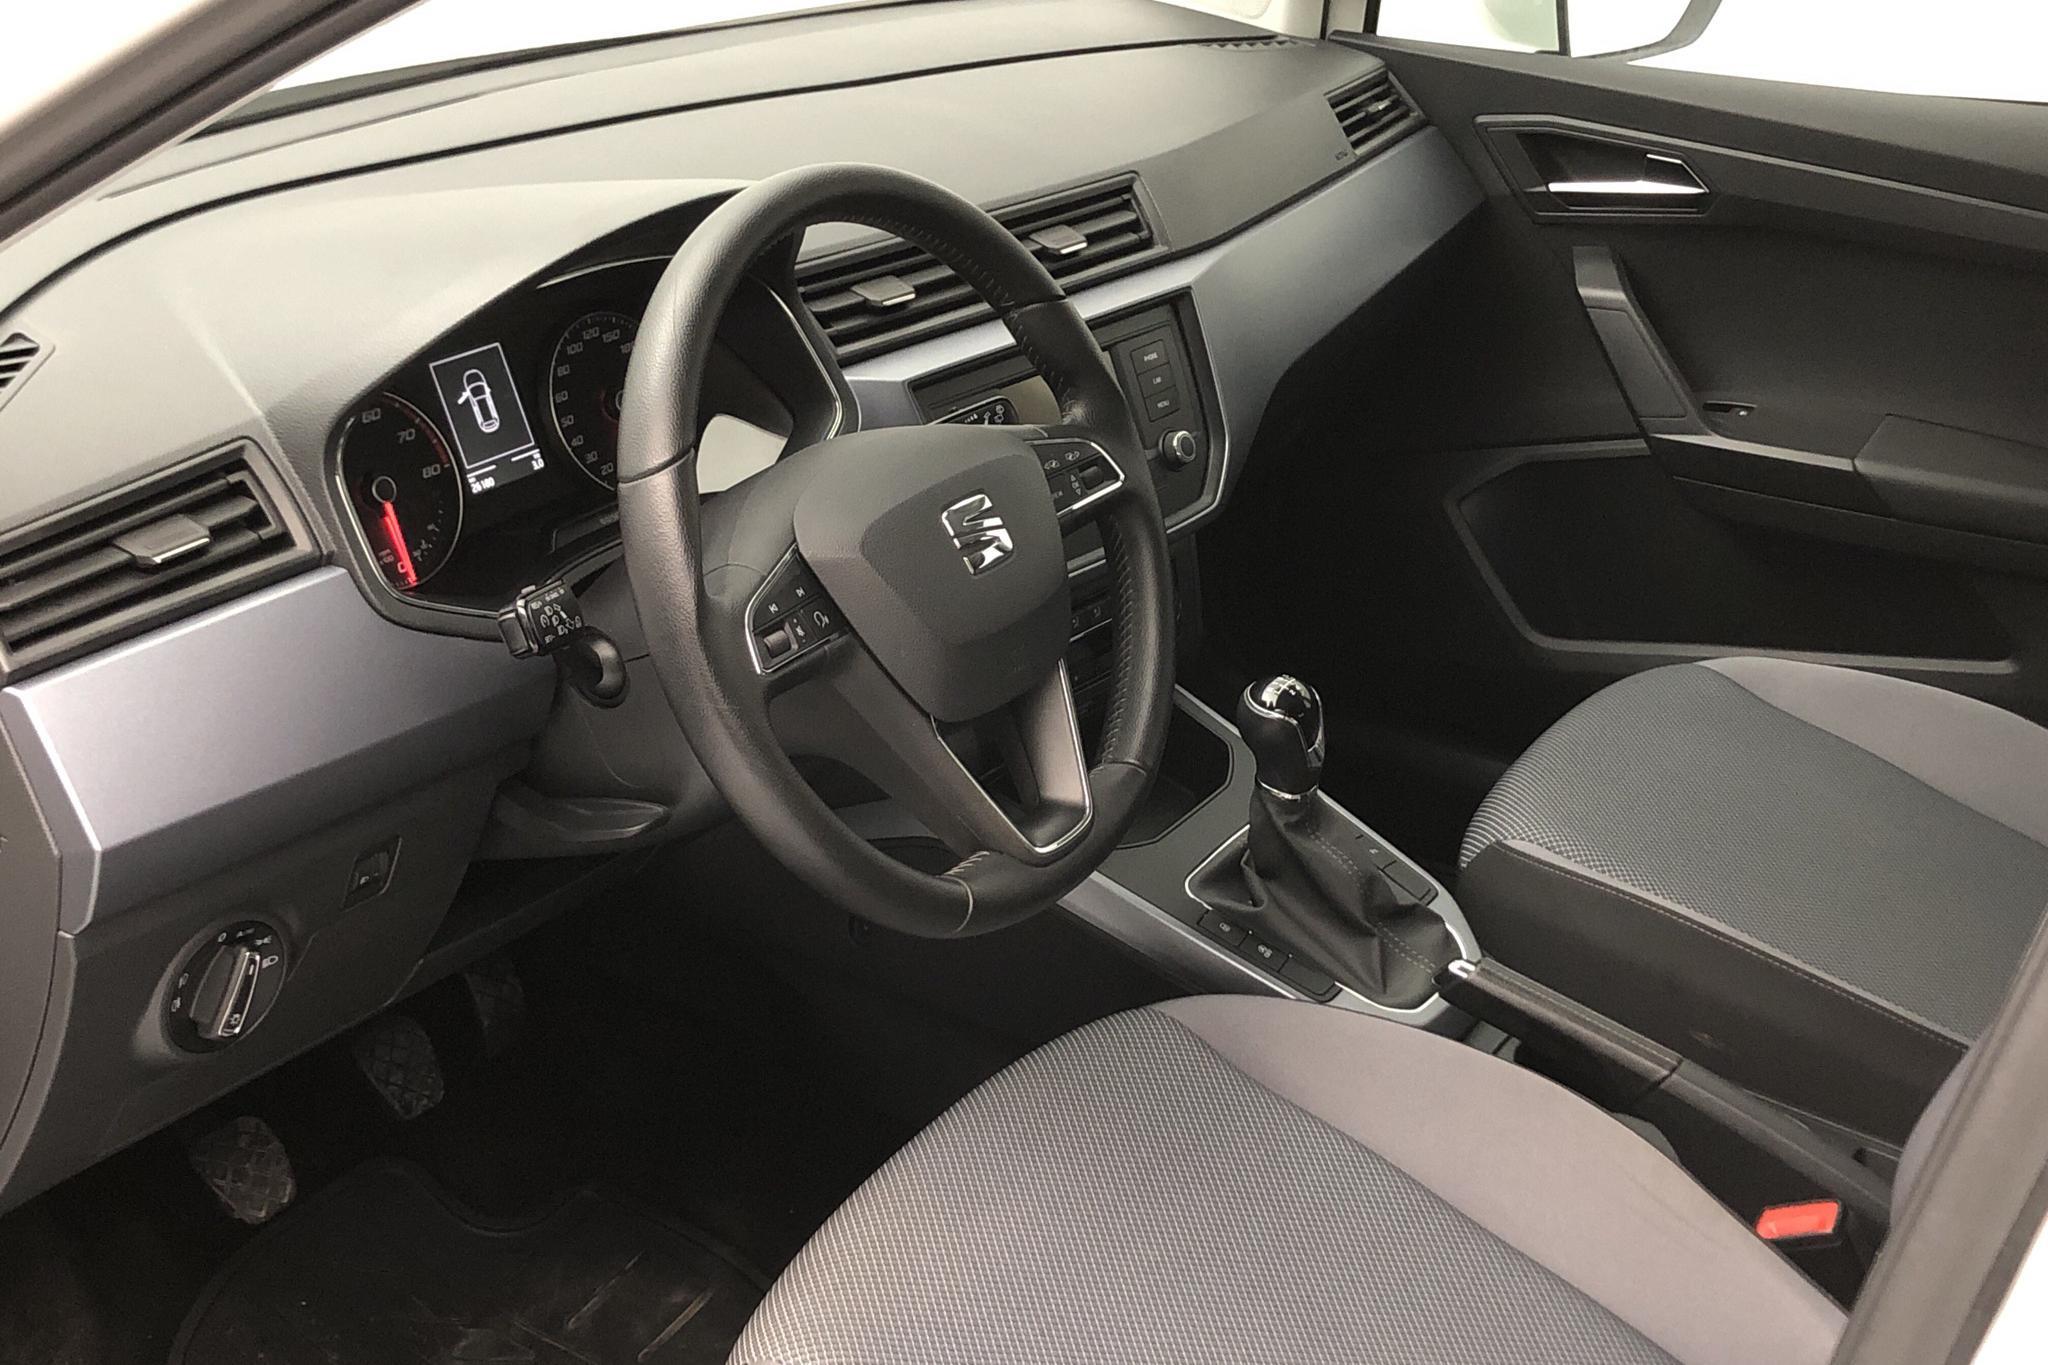 Seat Arona 1.0 TSI 5dr (95hk) - 26 170 km - Manual - white - 2018